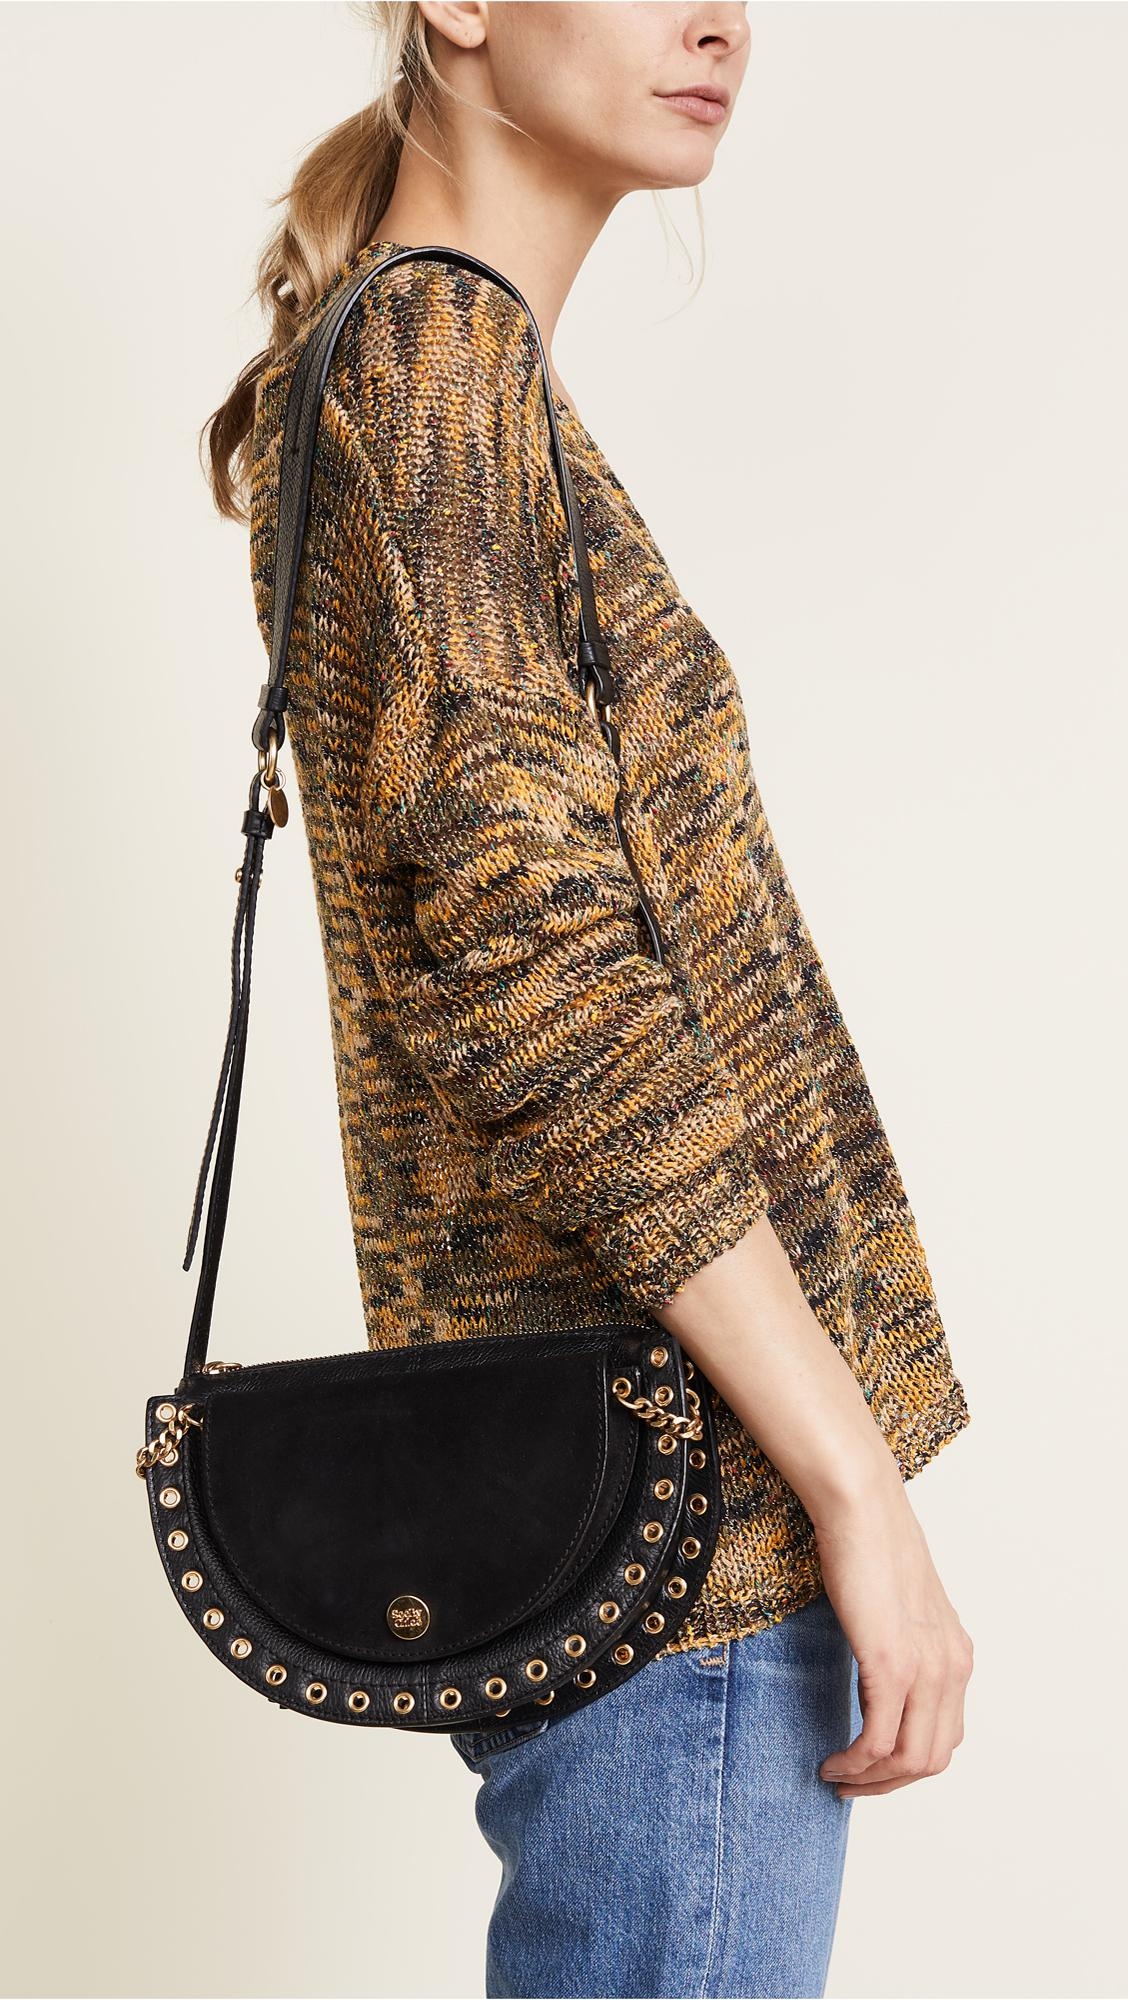 7b7701ef See By Chloé Black Kriss Medium Shoulder Bag